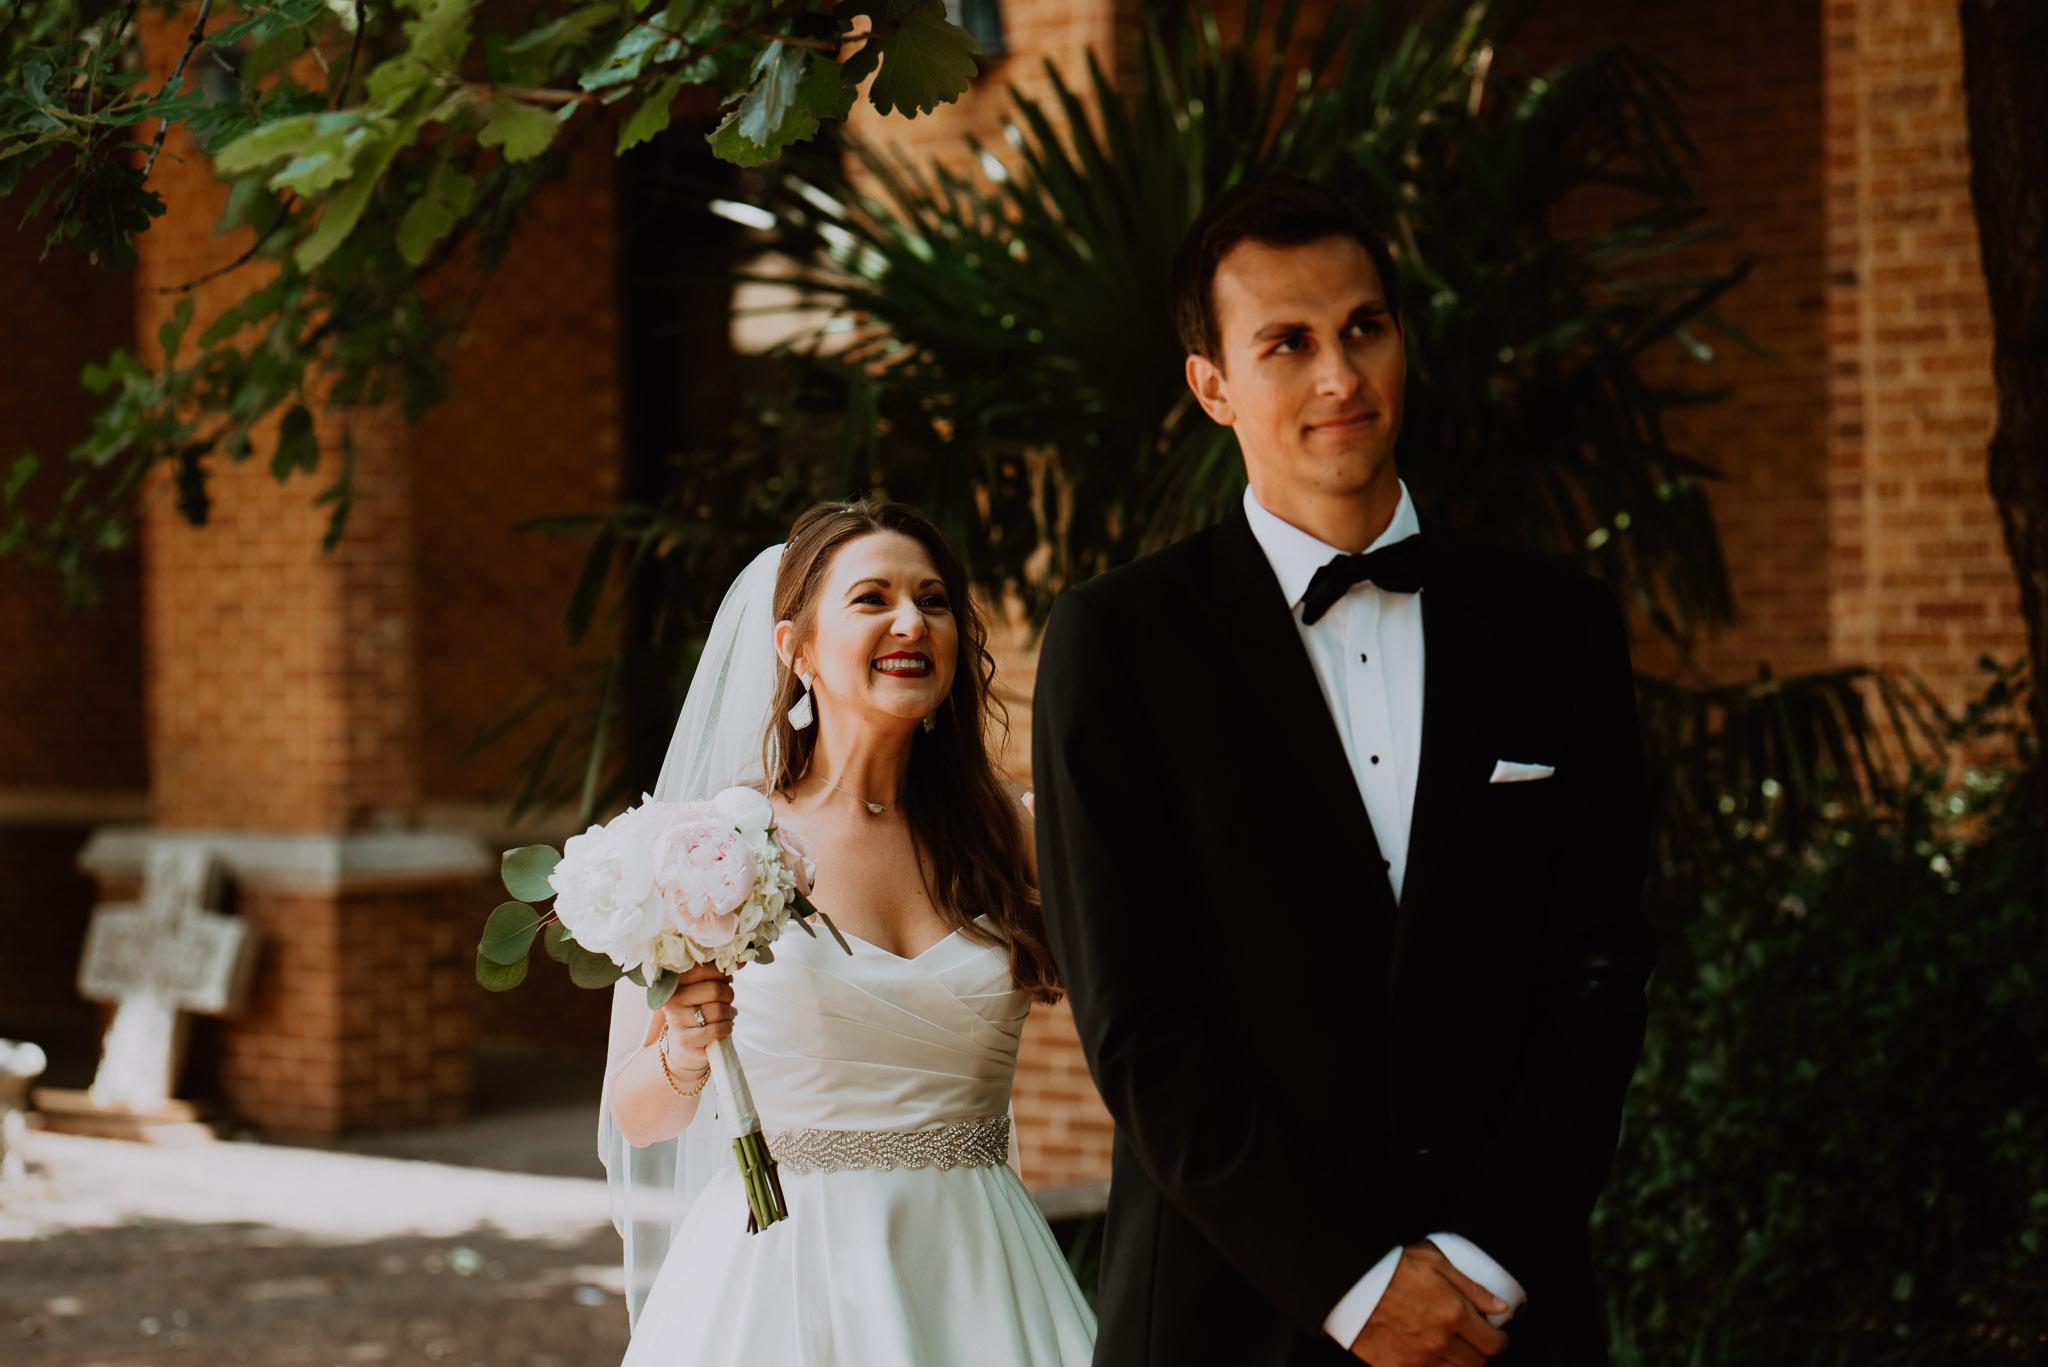 Bentwood-country-club-wedding-shea-tyson-0008.jpg